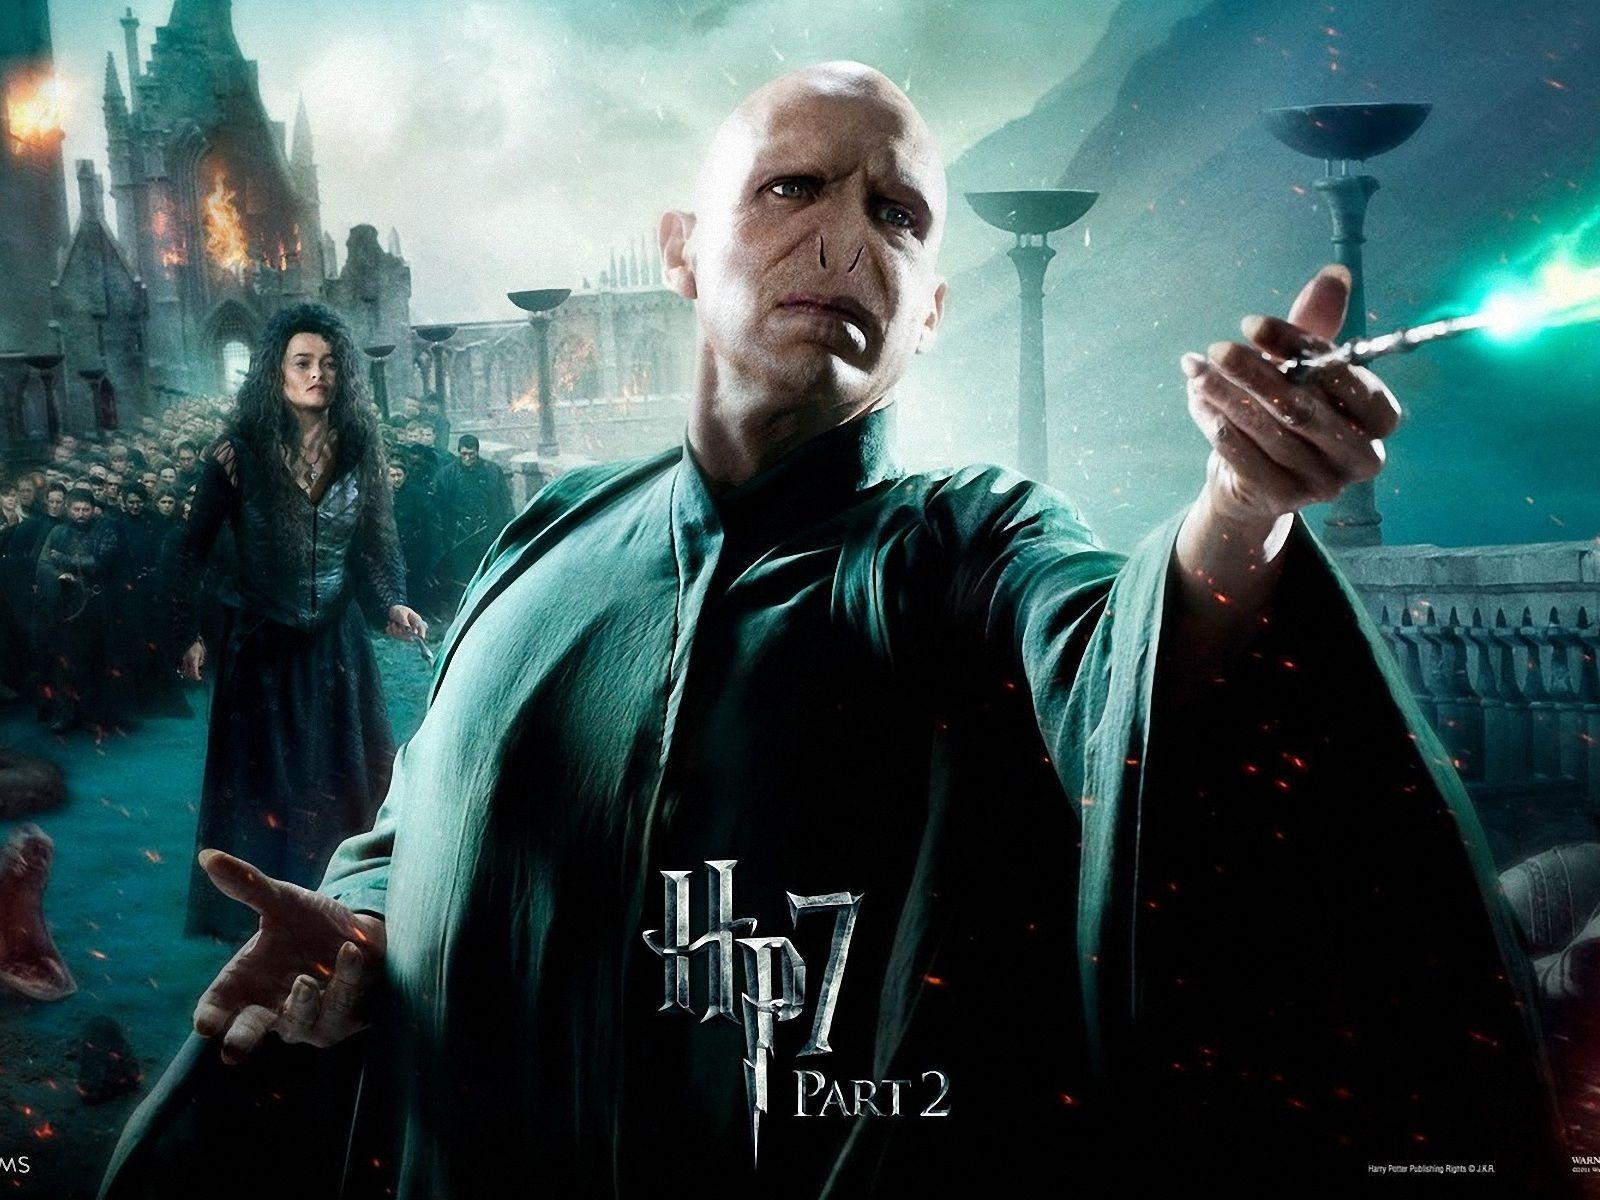 Wallpaper Harry Potter Bellatrix Lestrange Harry Potter Magic Harry Potter Severus Snape